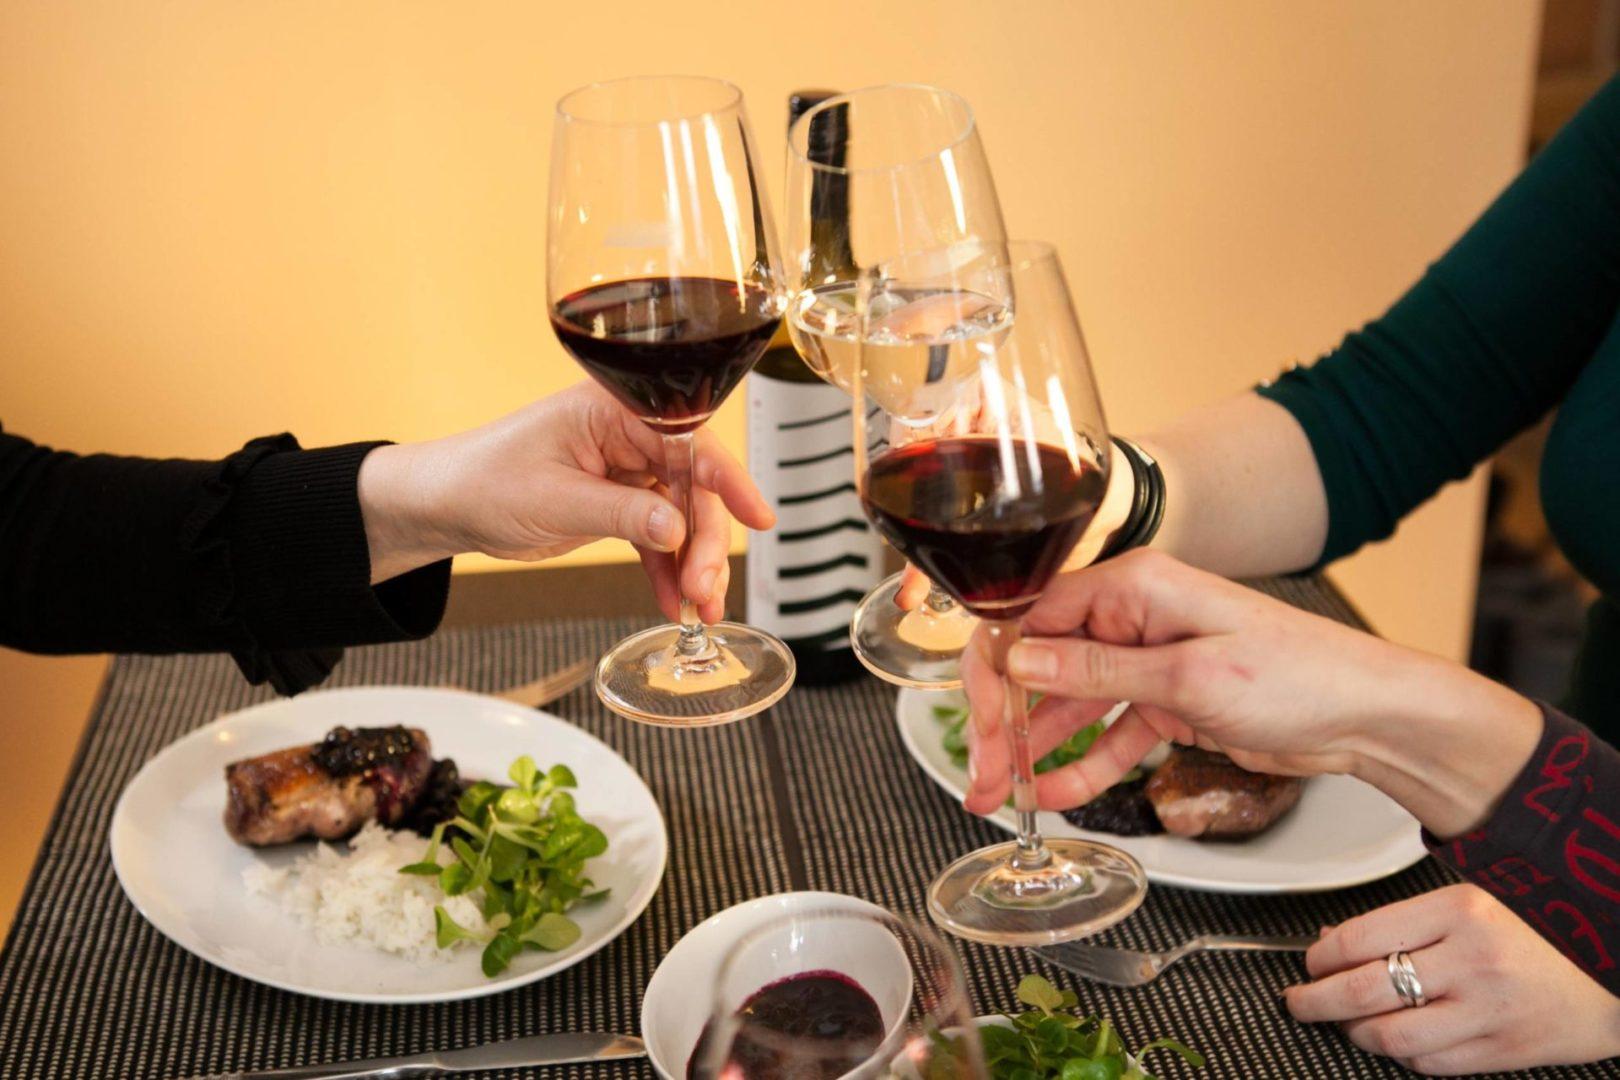 Bort mértékkel – Wine in Moderation